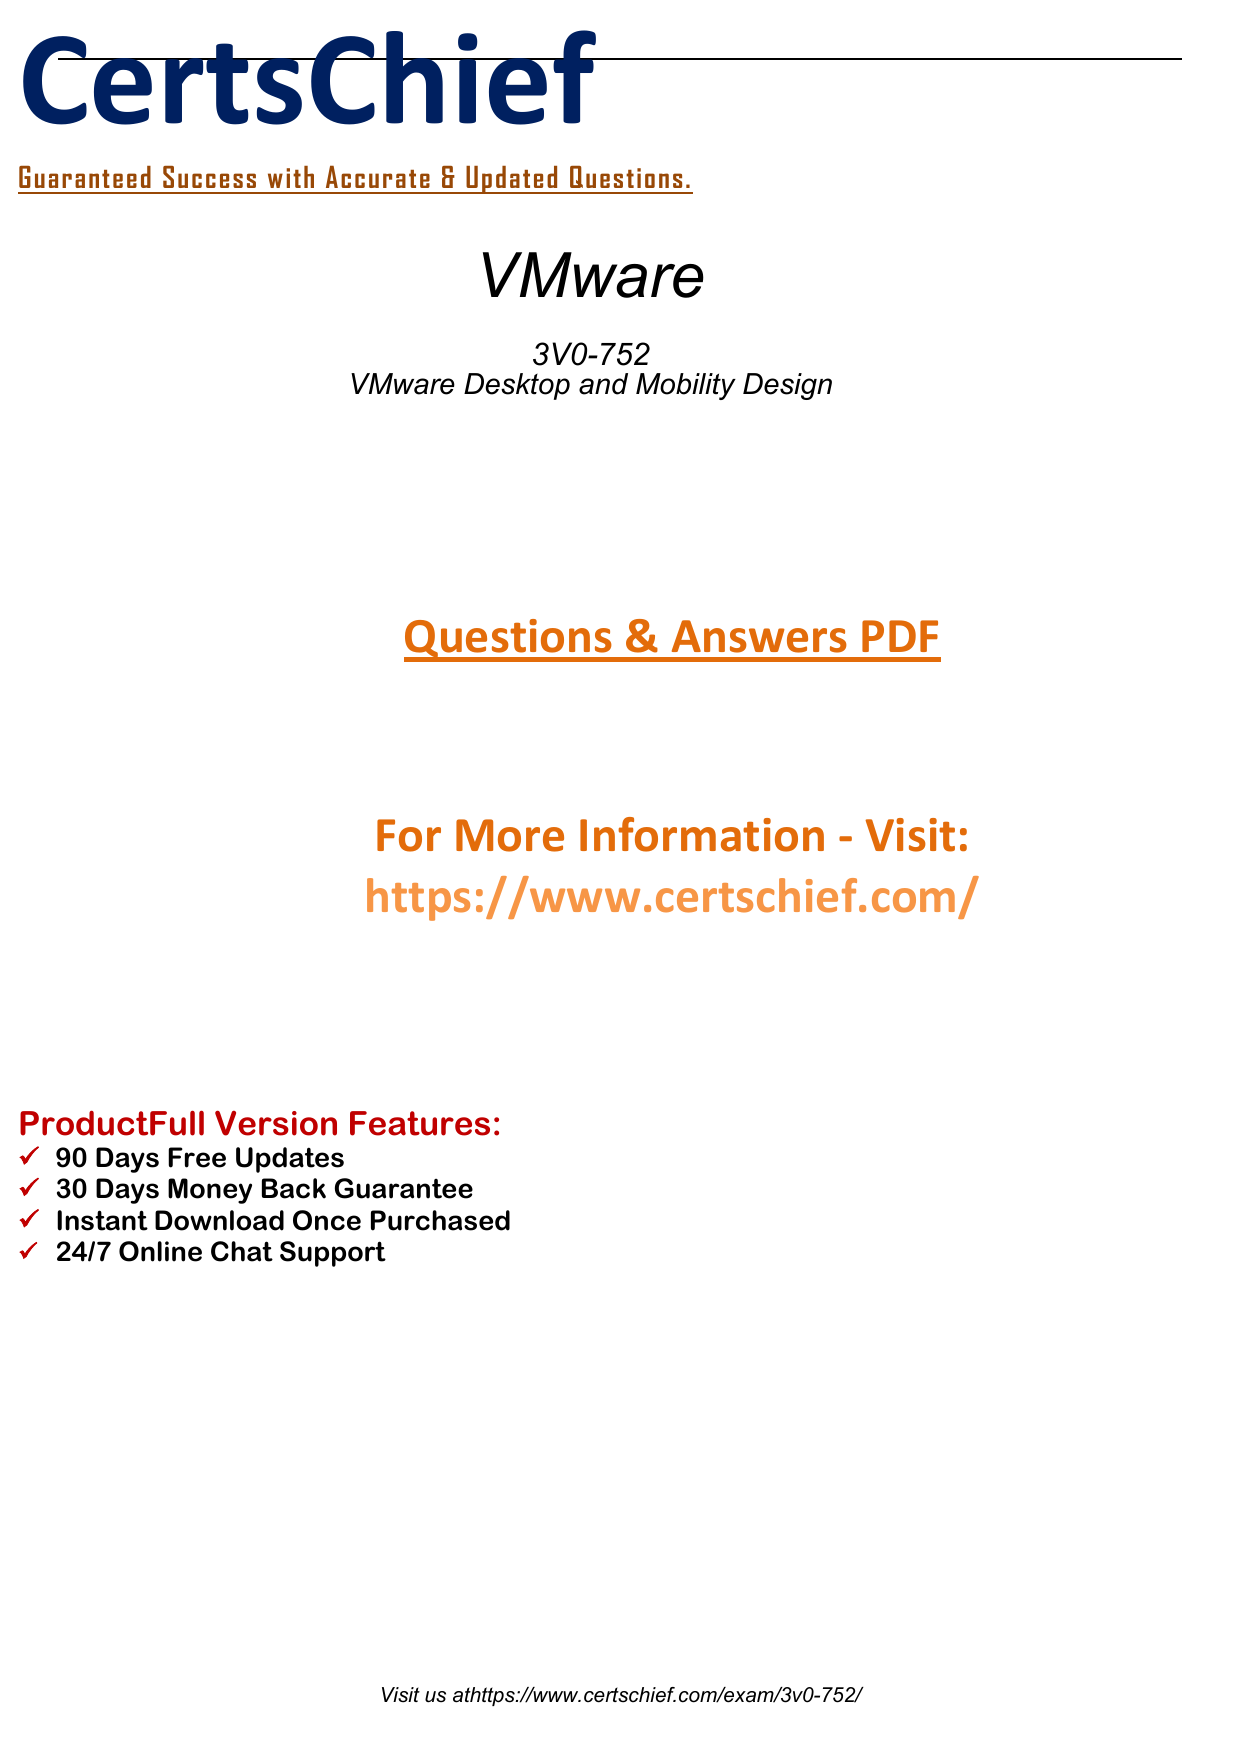 3V0-752 Real PDF Exam Preparation Guides 2019